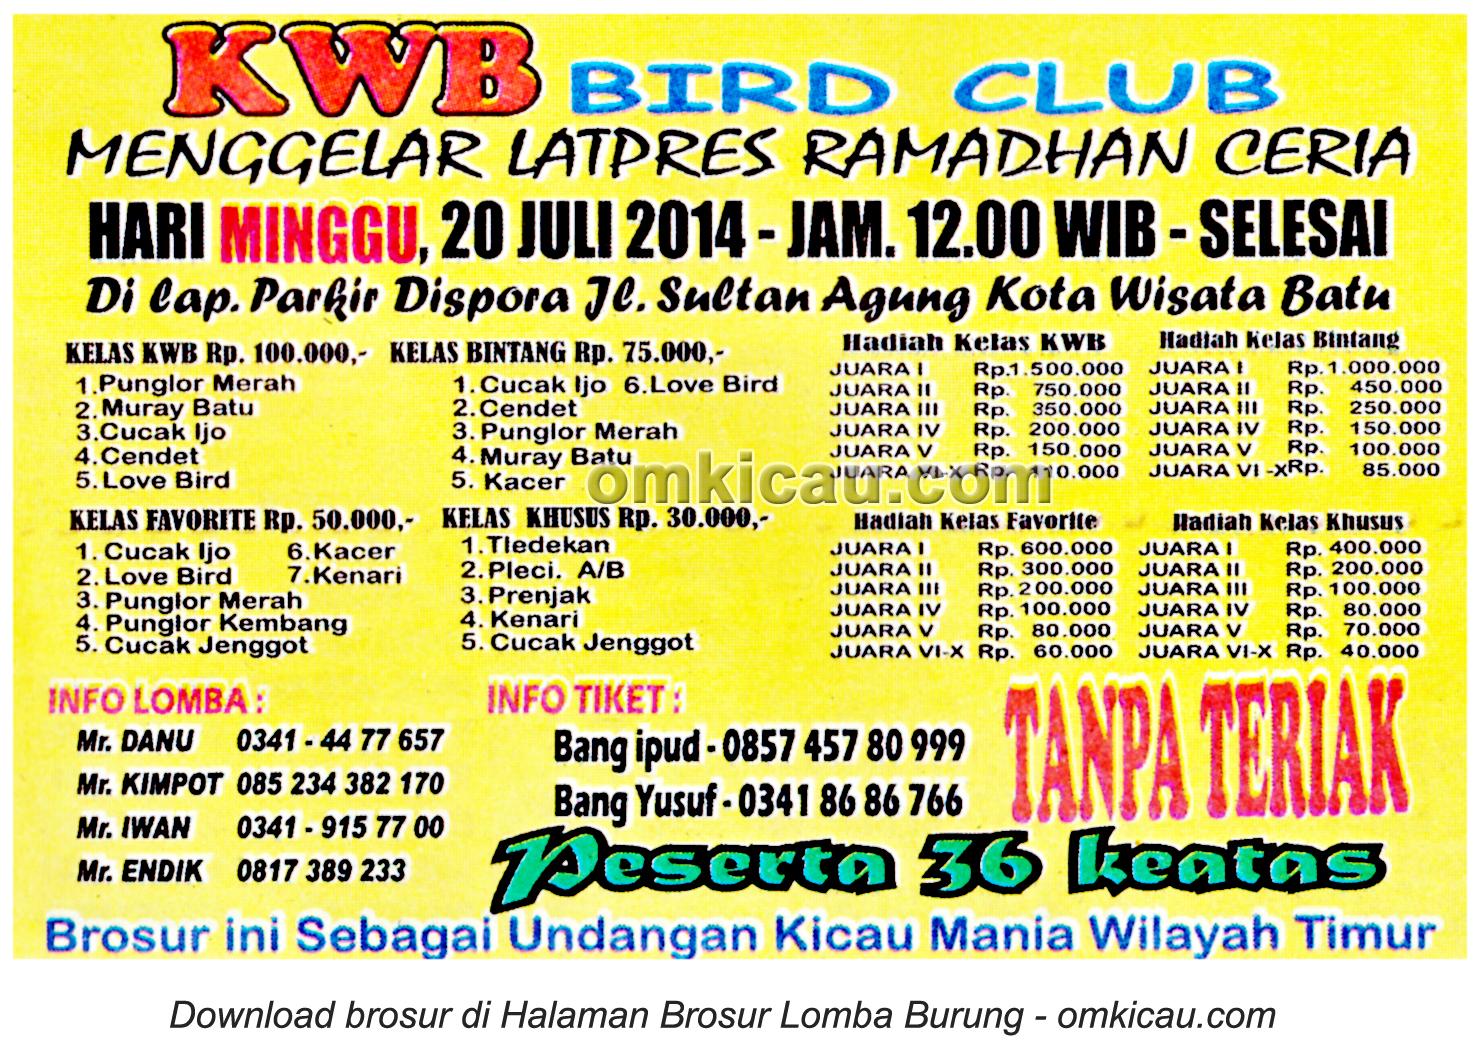 Brosur Latpres Ramadhan Ceria KWB BC, Batu, 20 Juli 2014